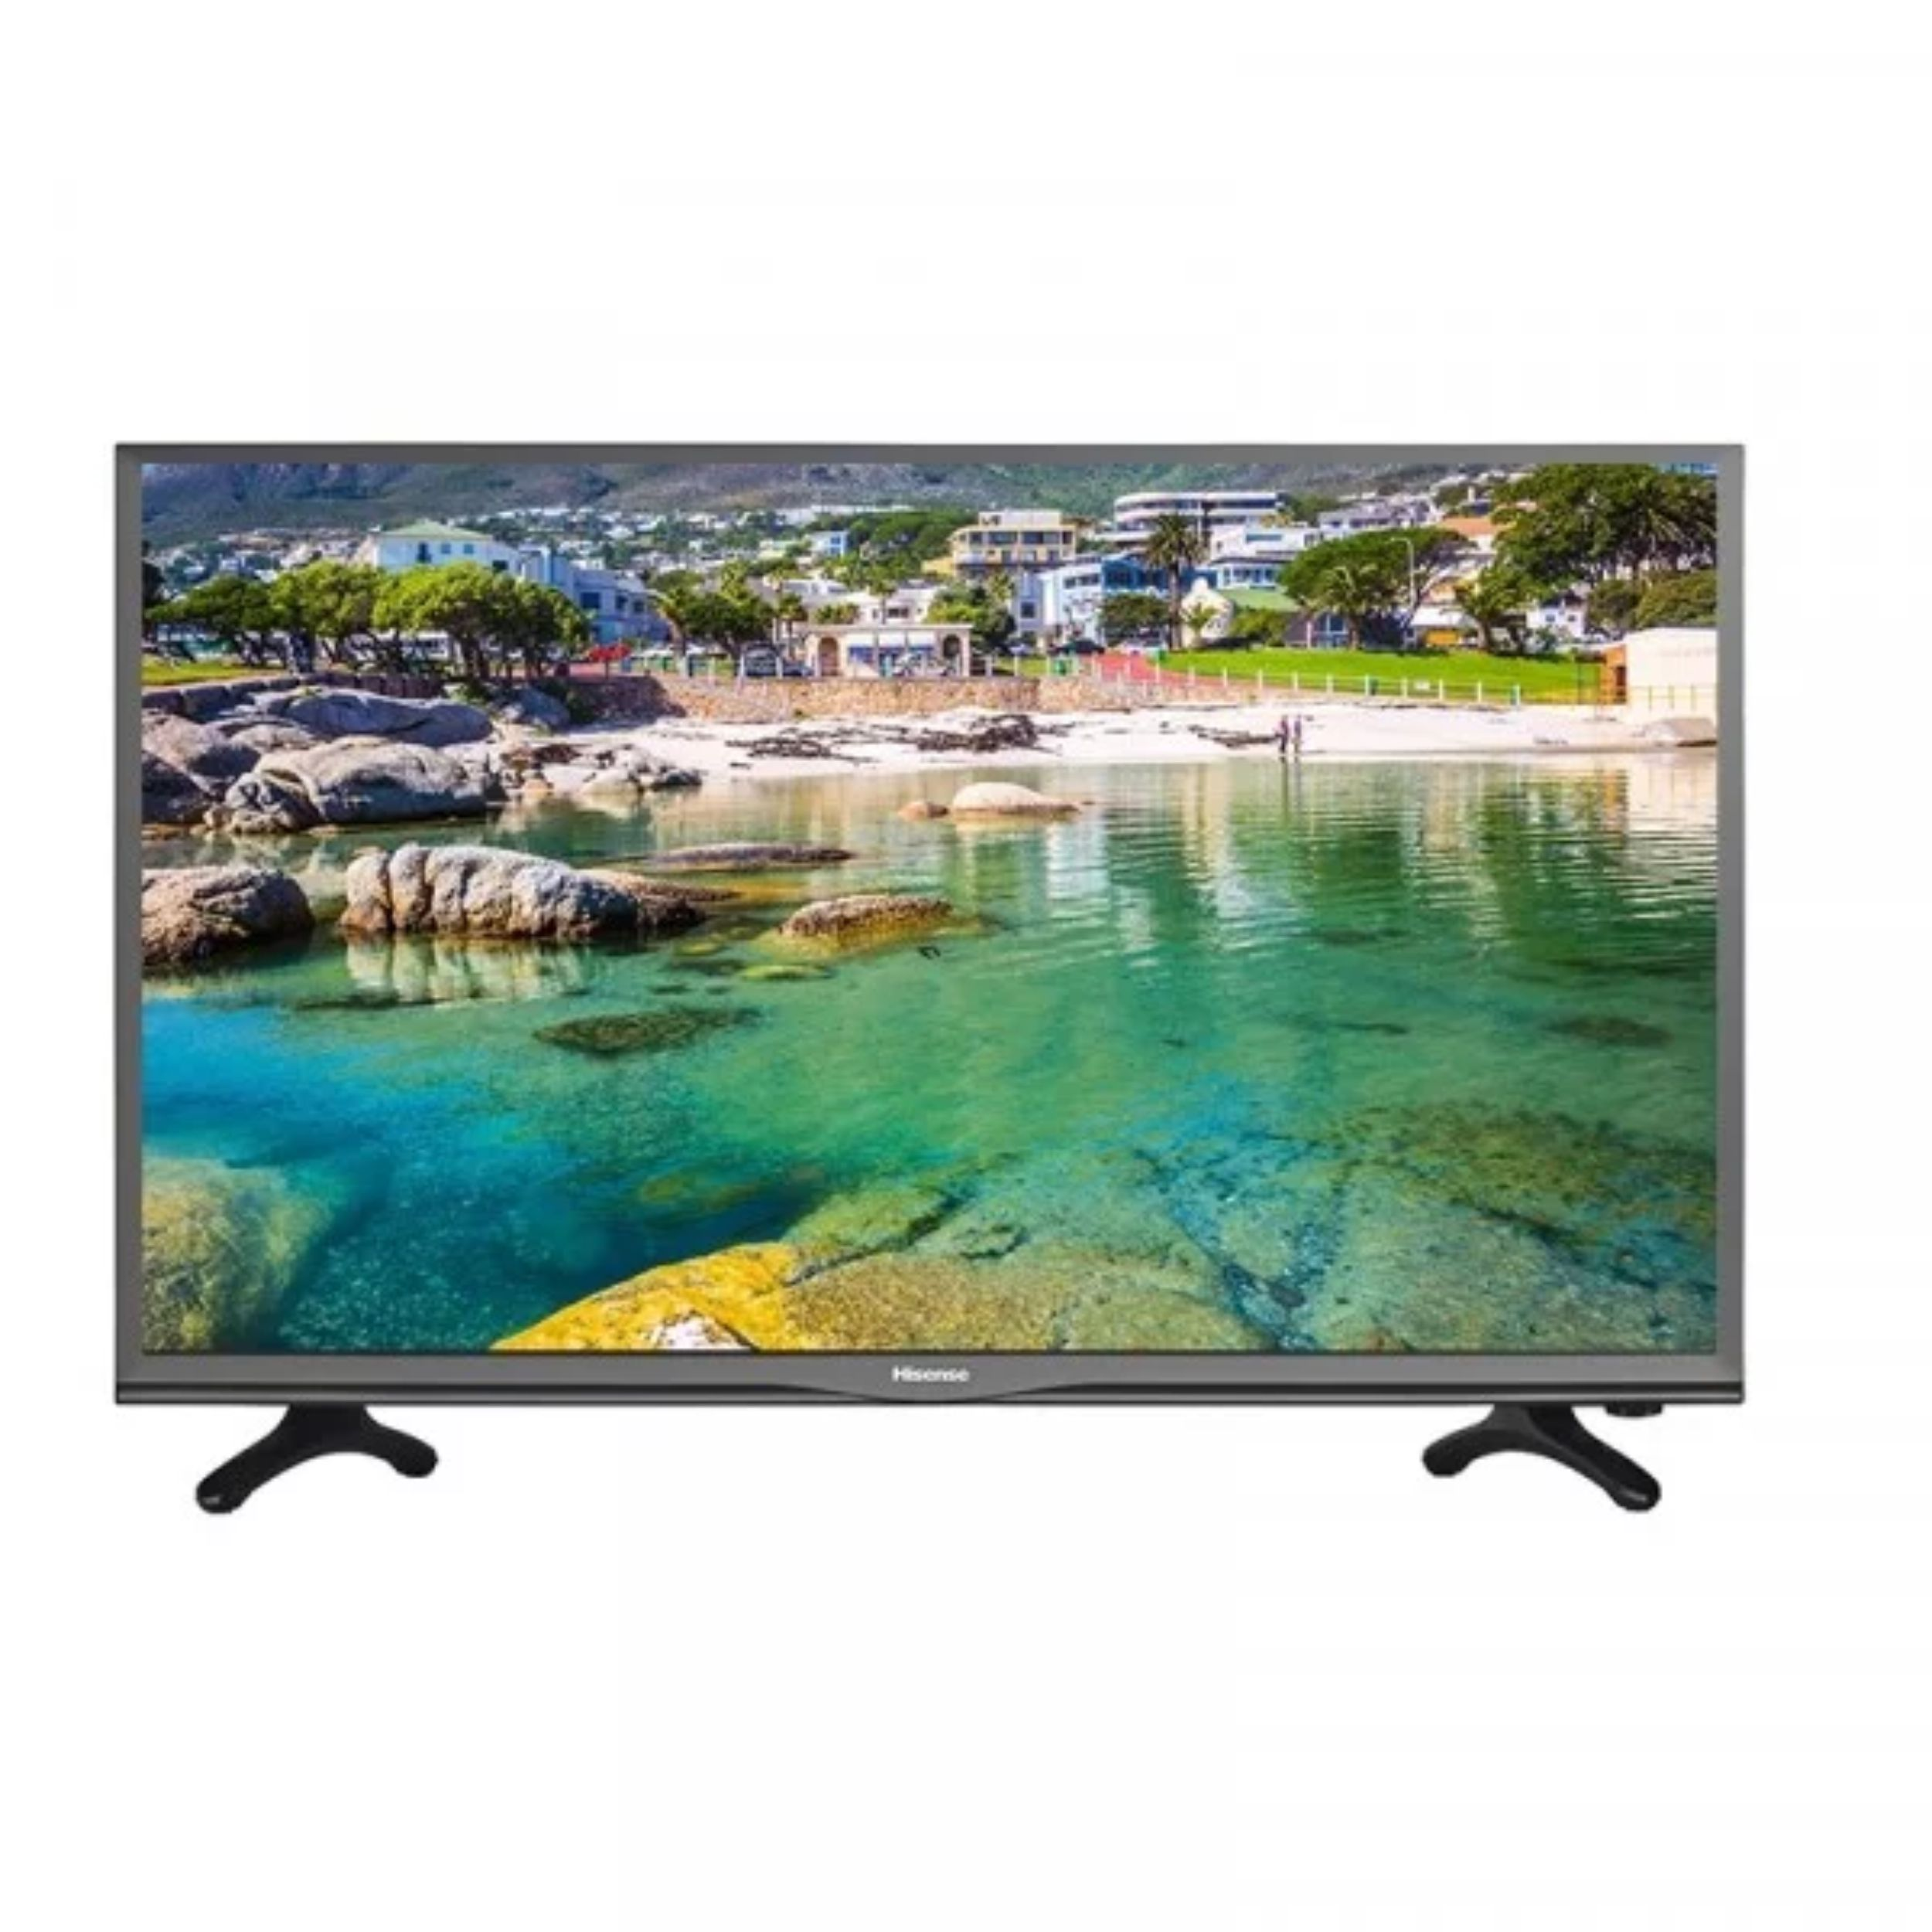 "HISENSE 43"" HD LED TV 43N2176"